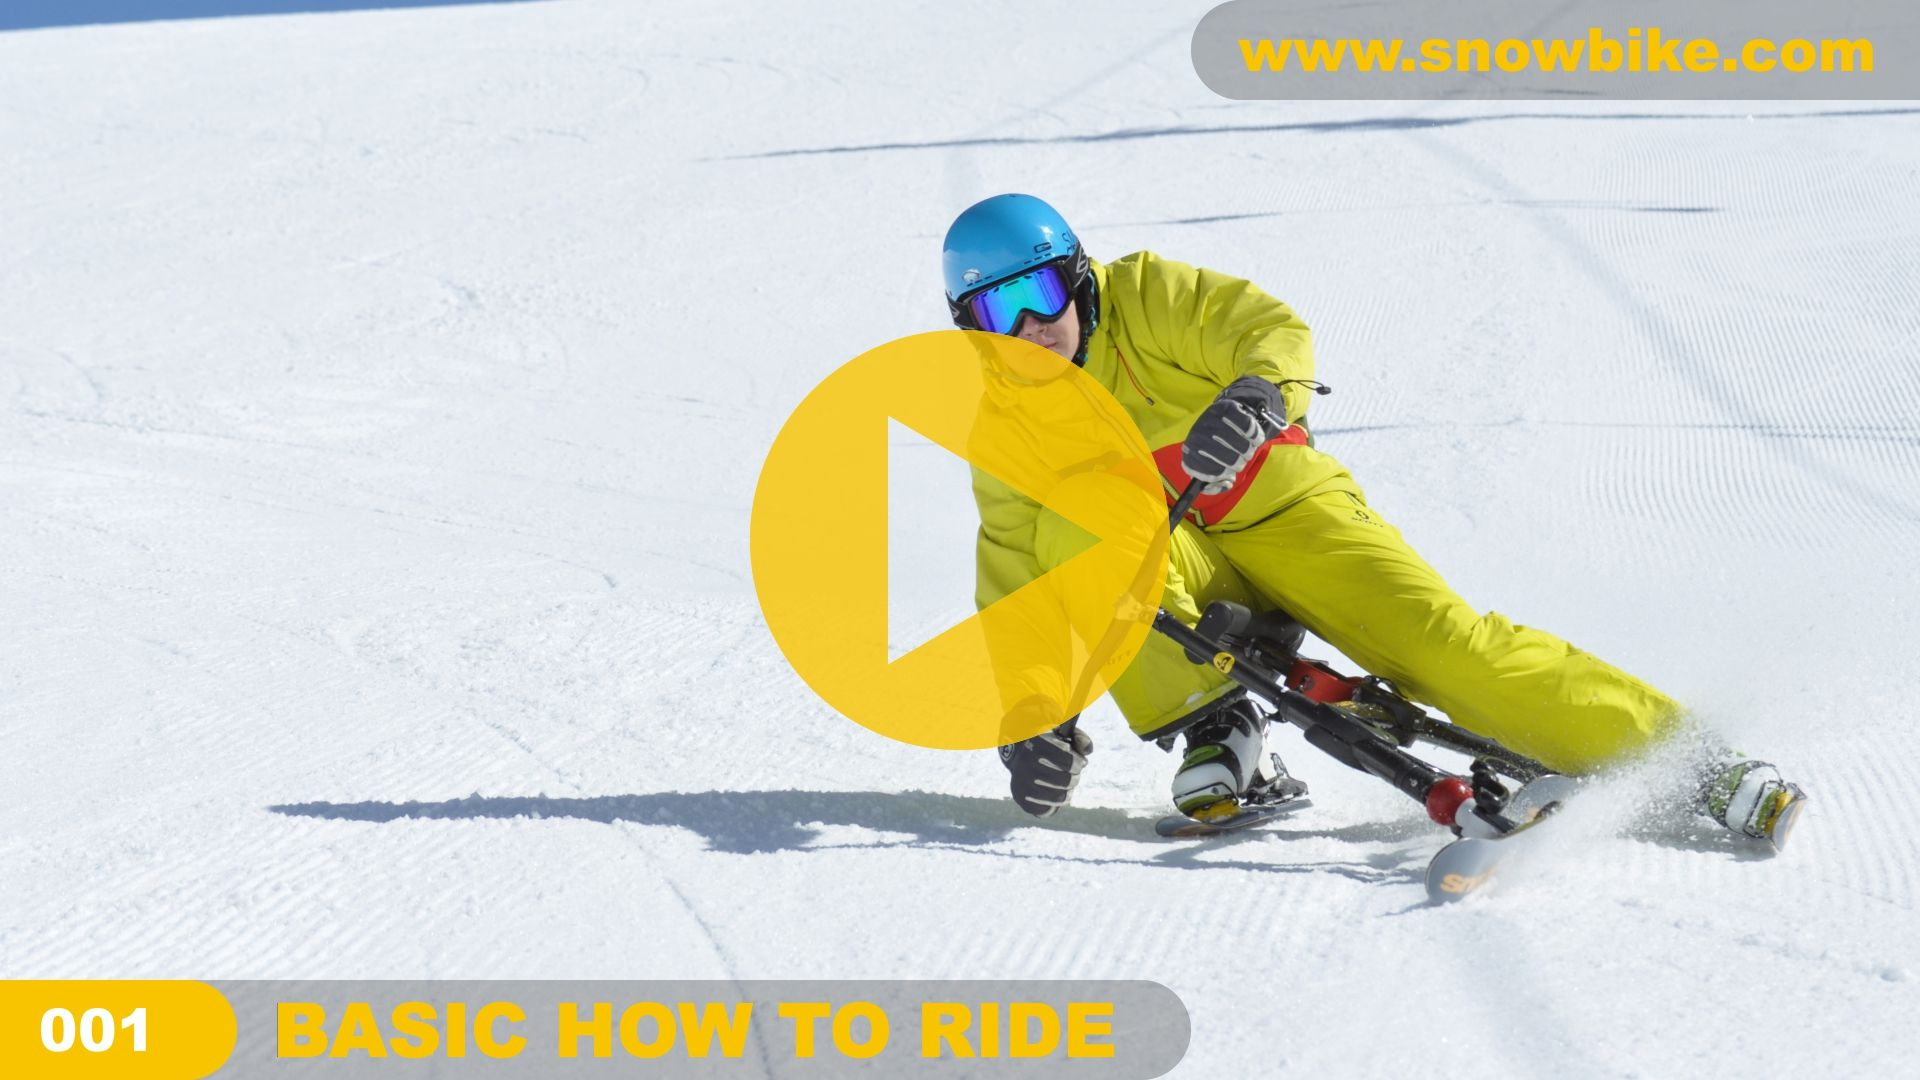 snowbike-basics-how-to-ride-cover4D4DD86E-951B-B813-7CC0-492F68862850.jpg